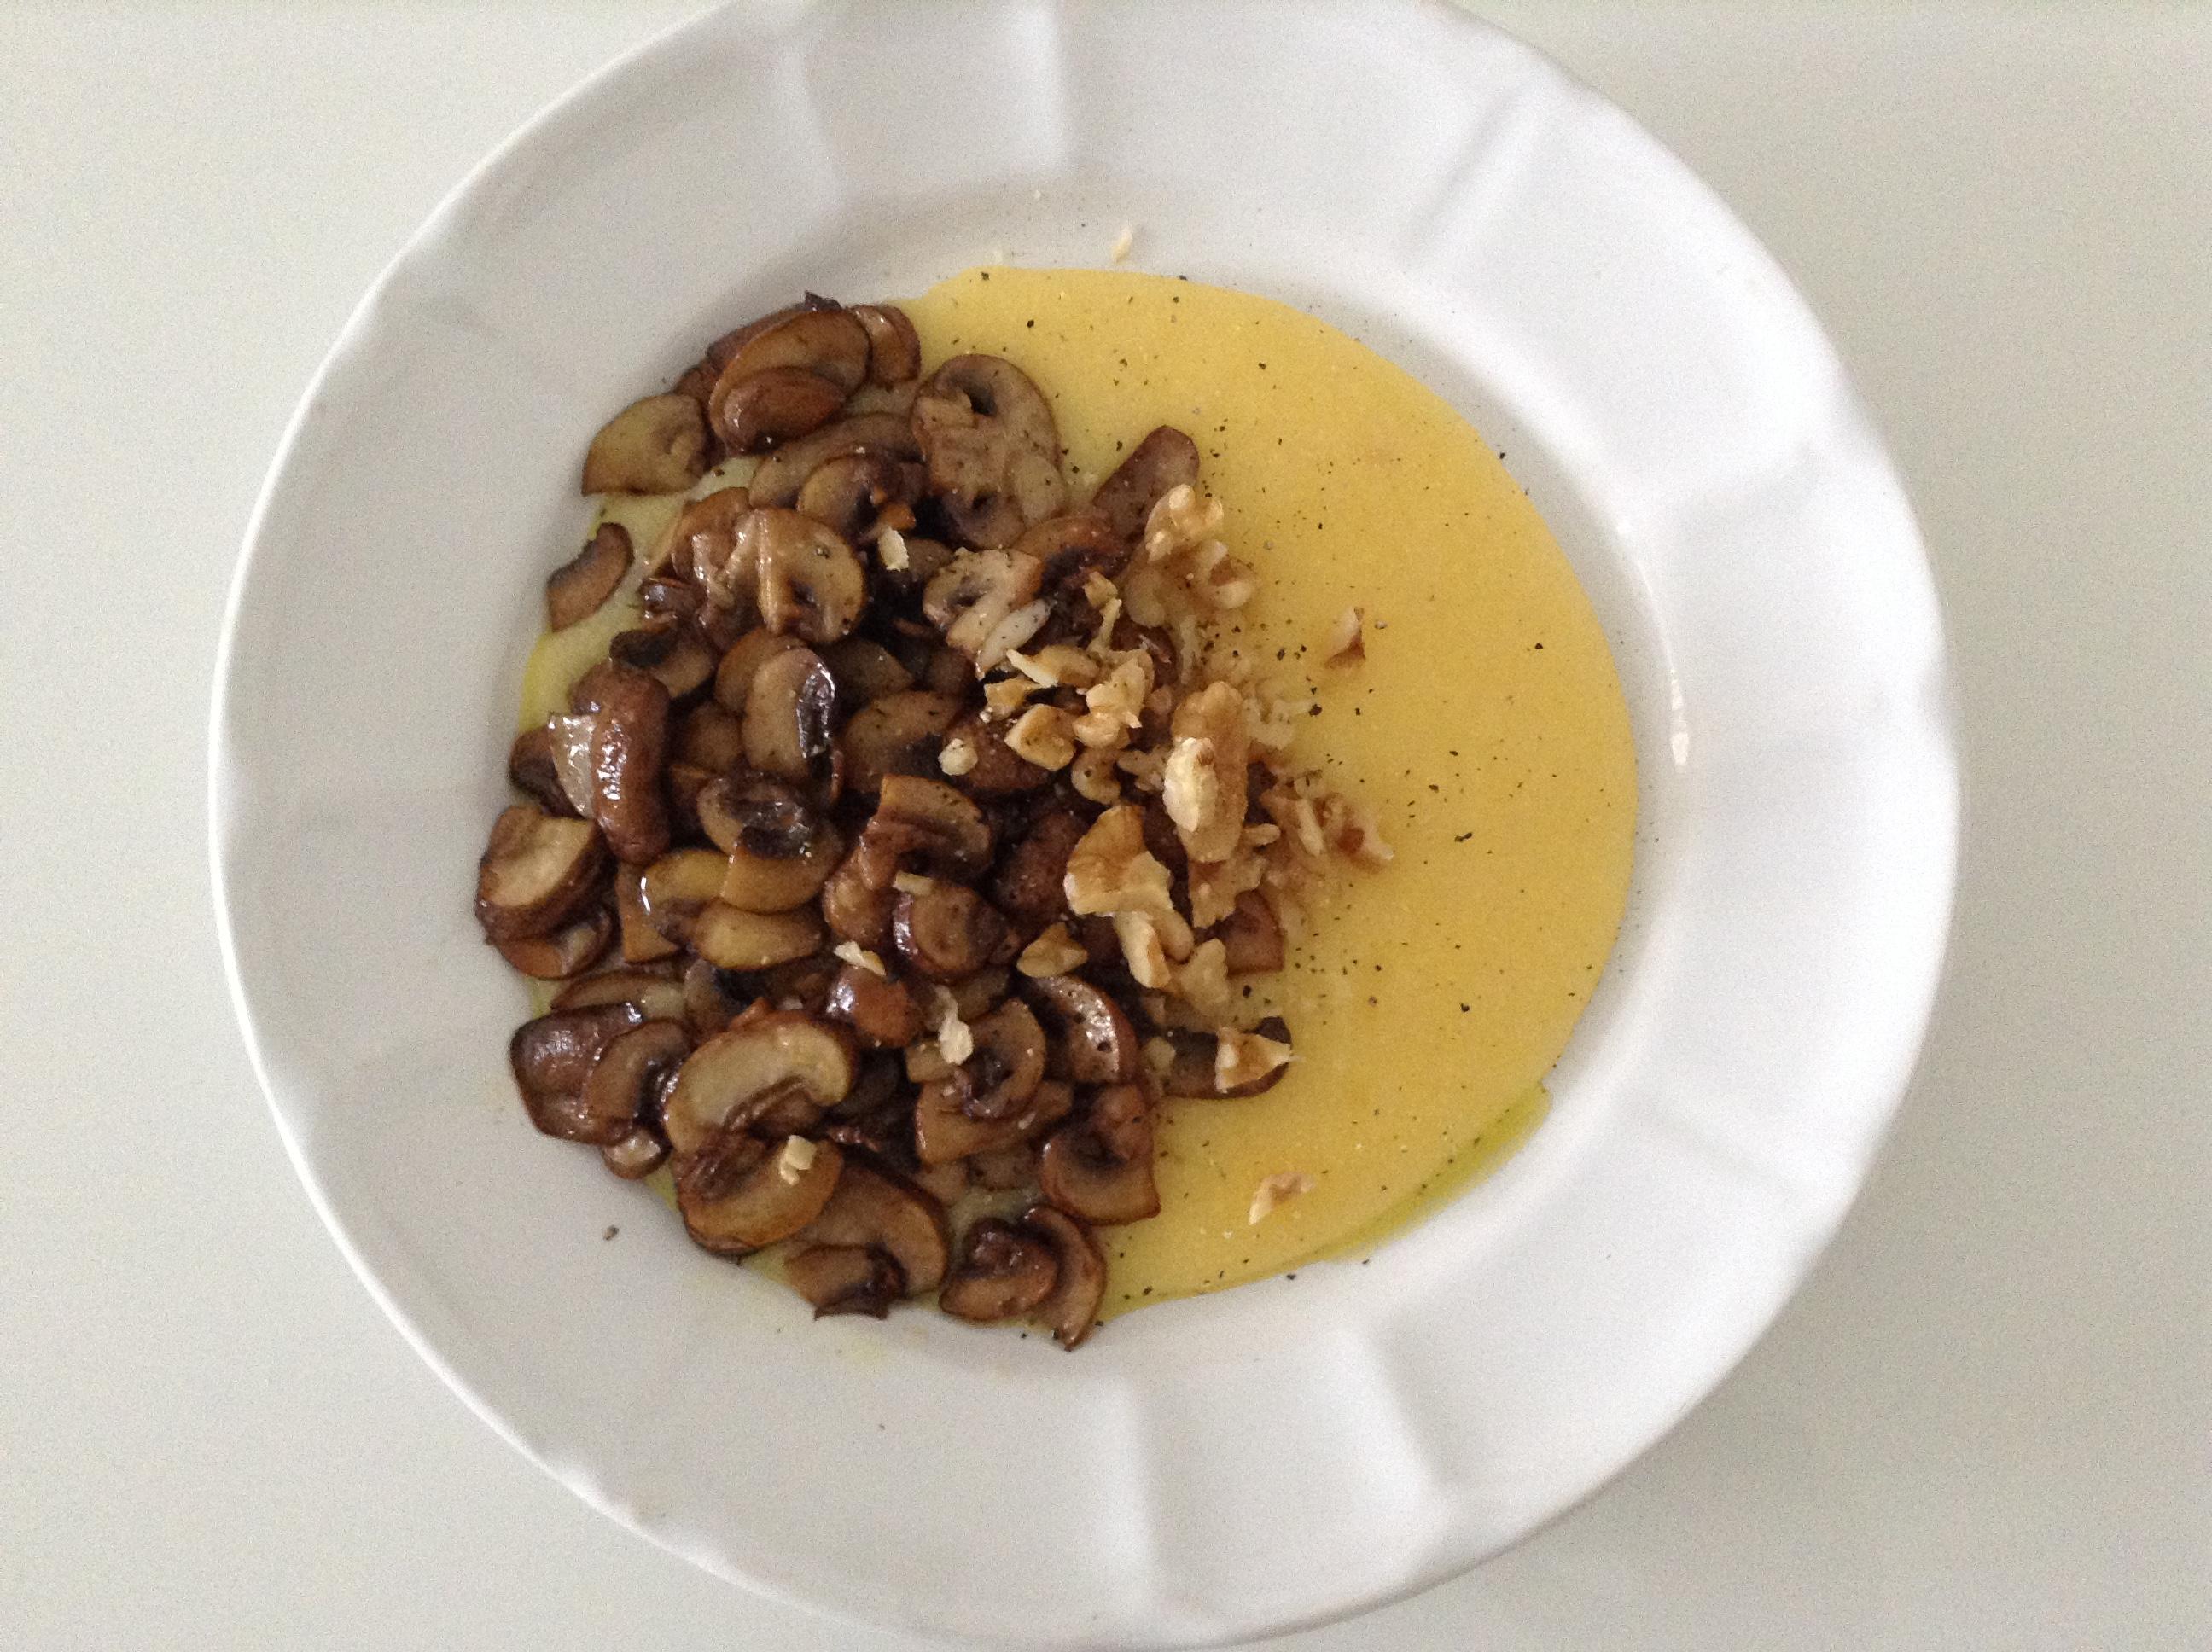 Polenta with mushrooms & crushed walnuts